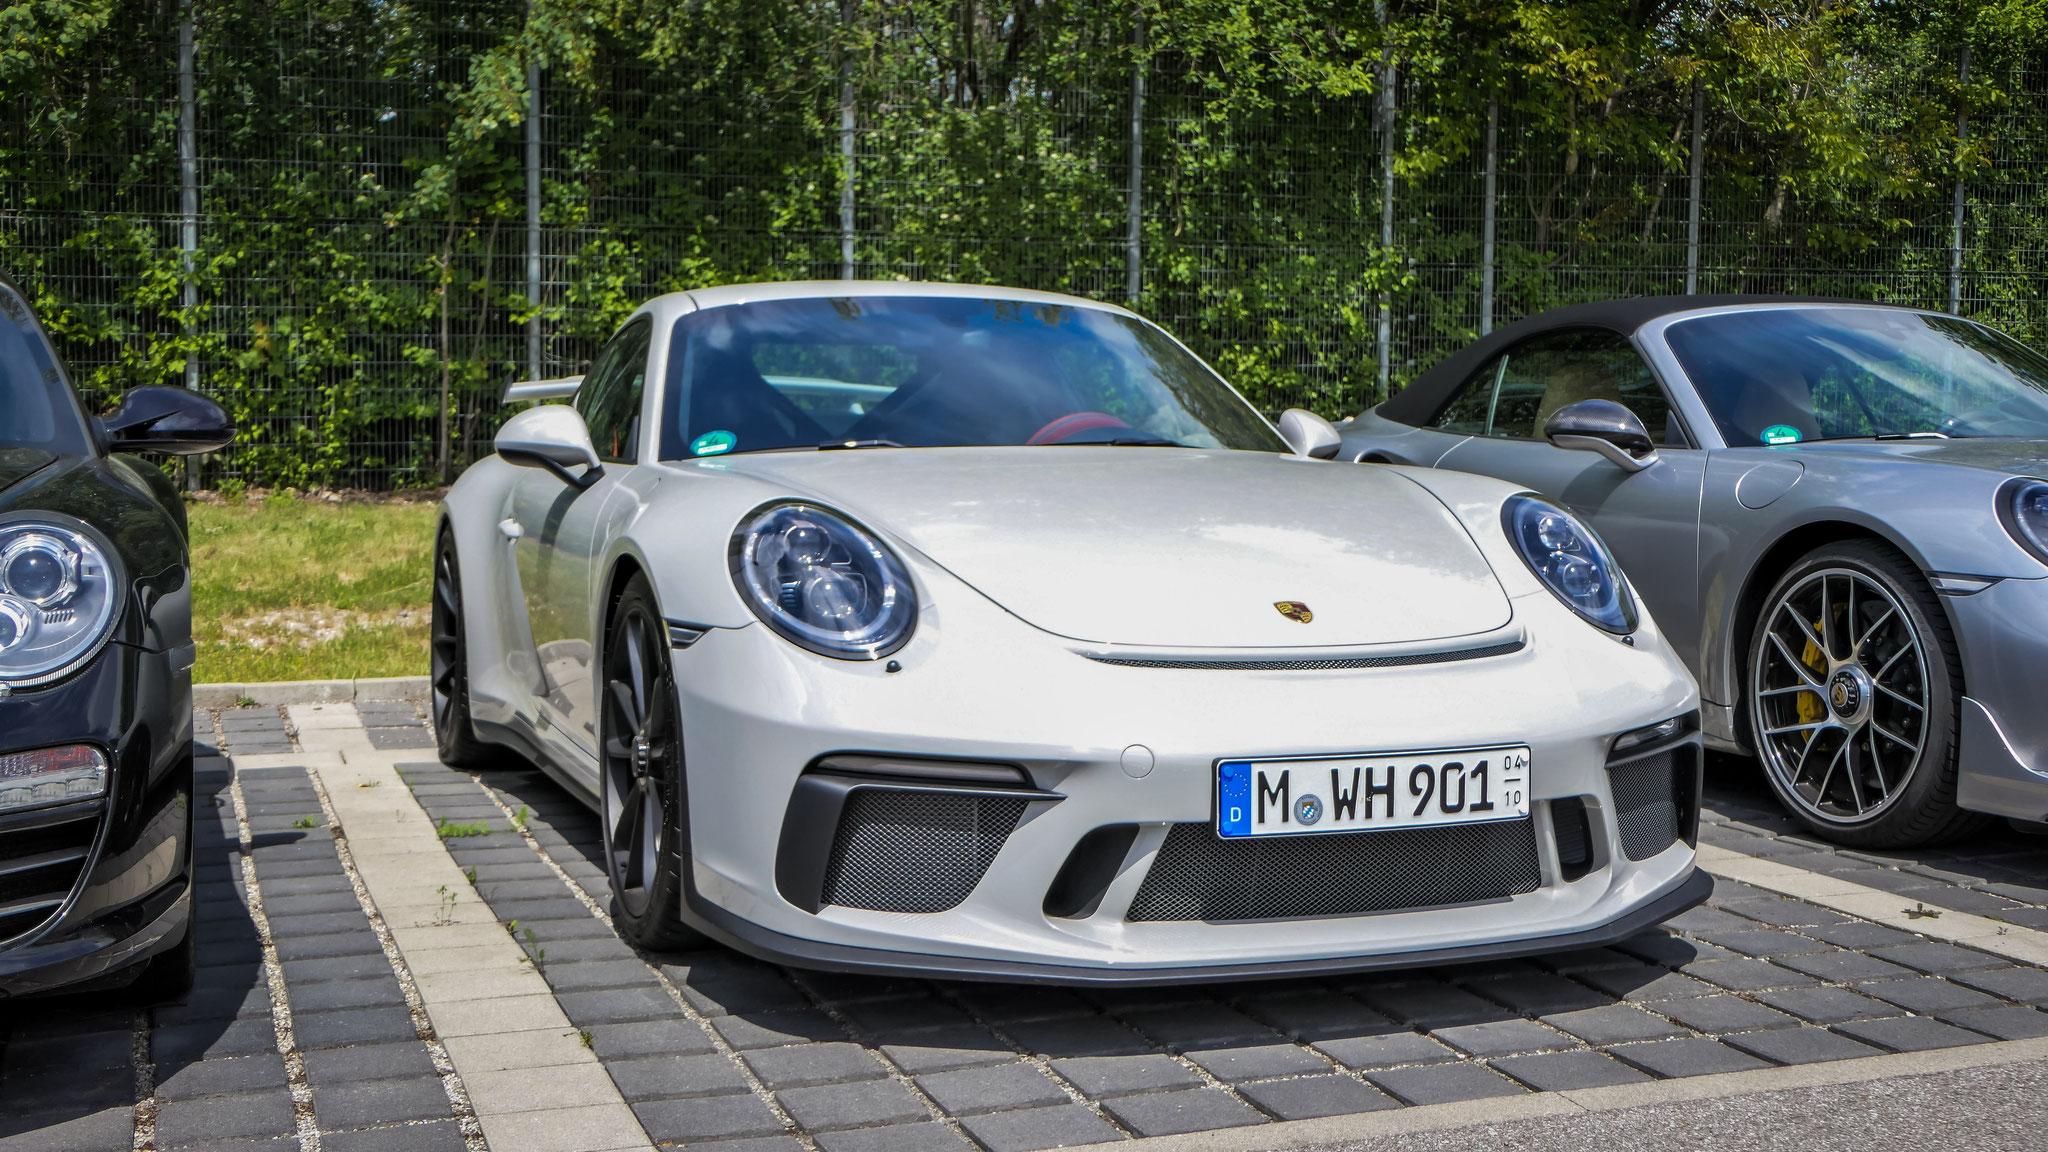 Porsche 991 GT3 - M-WH-901